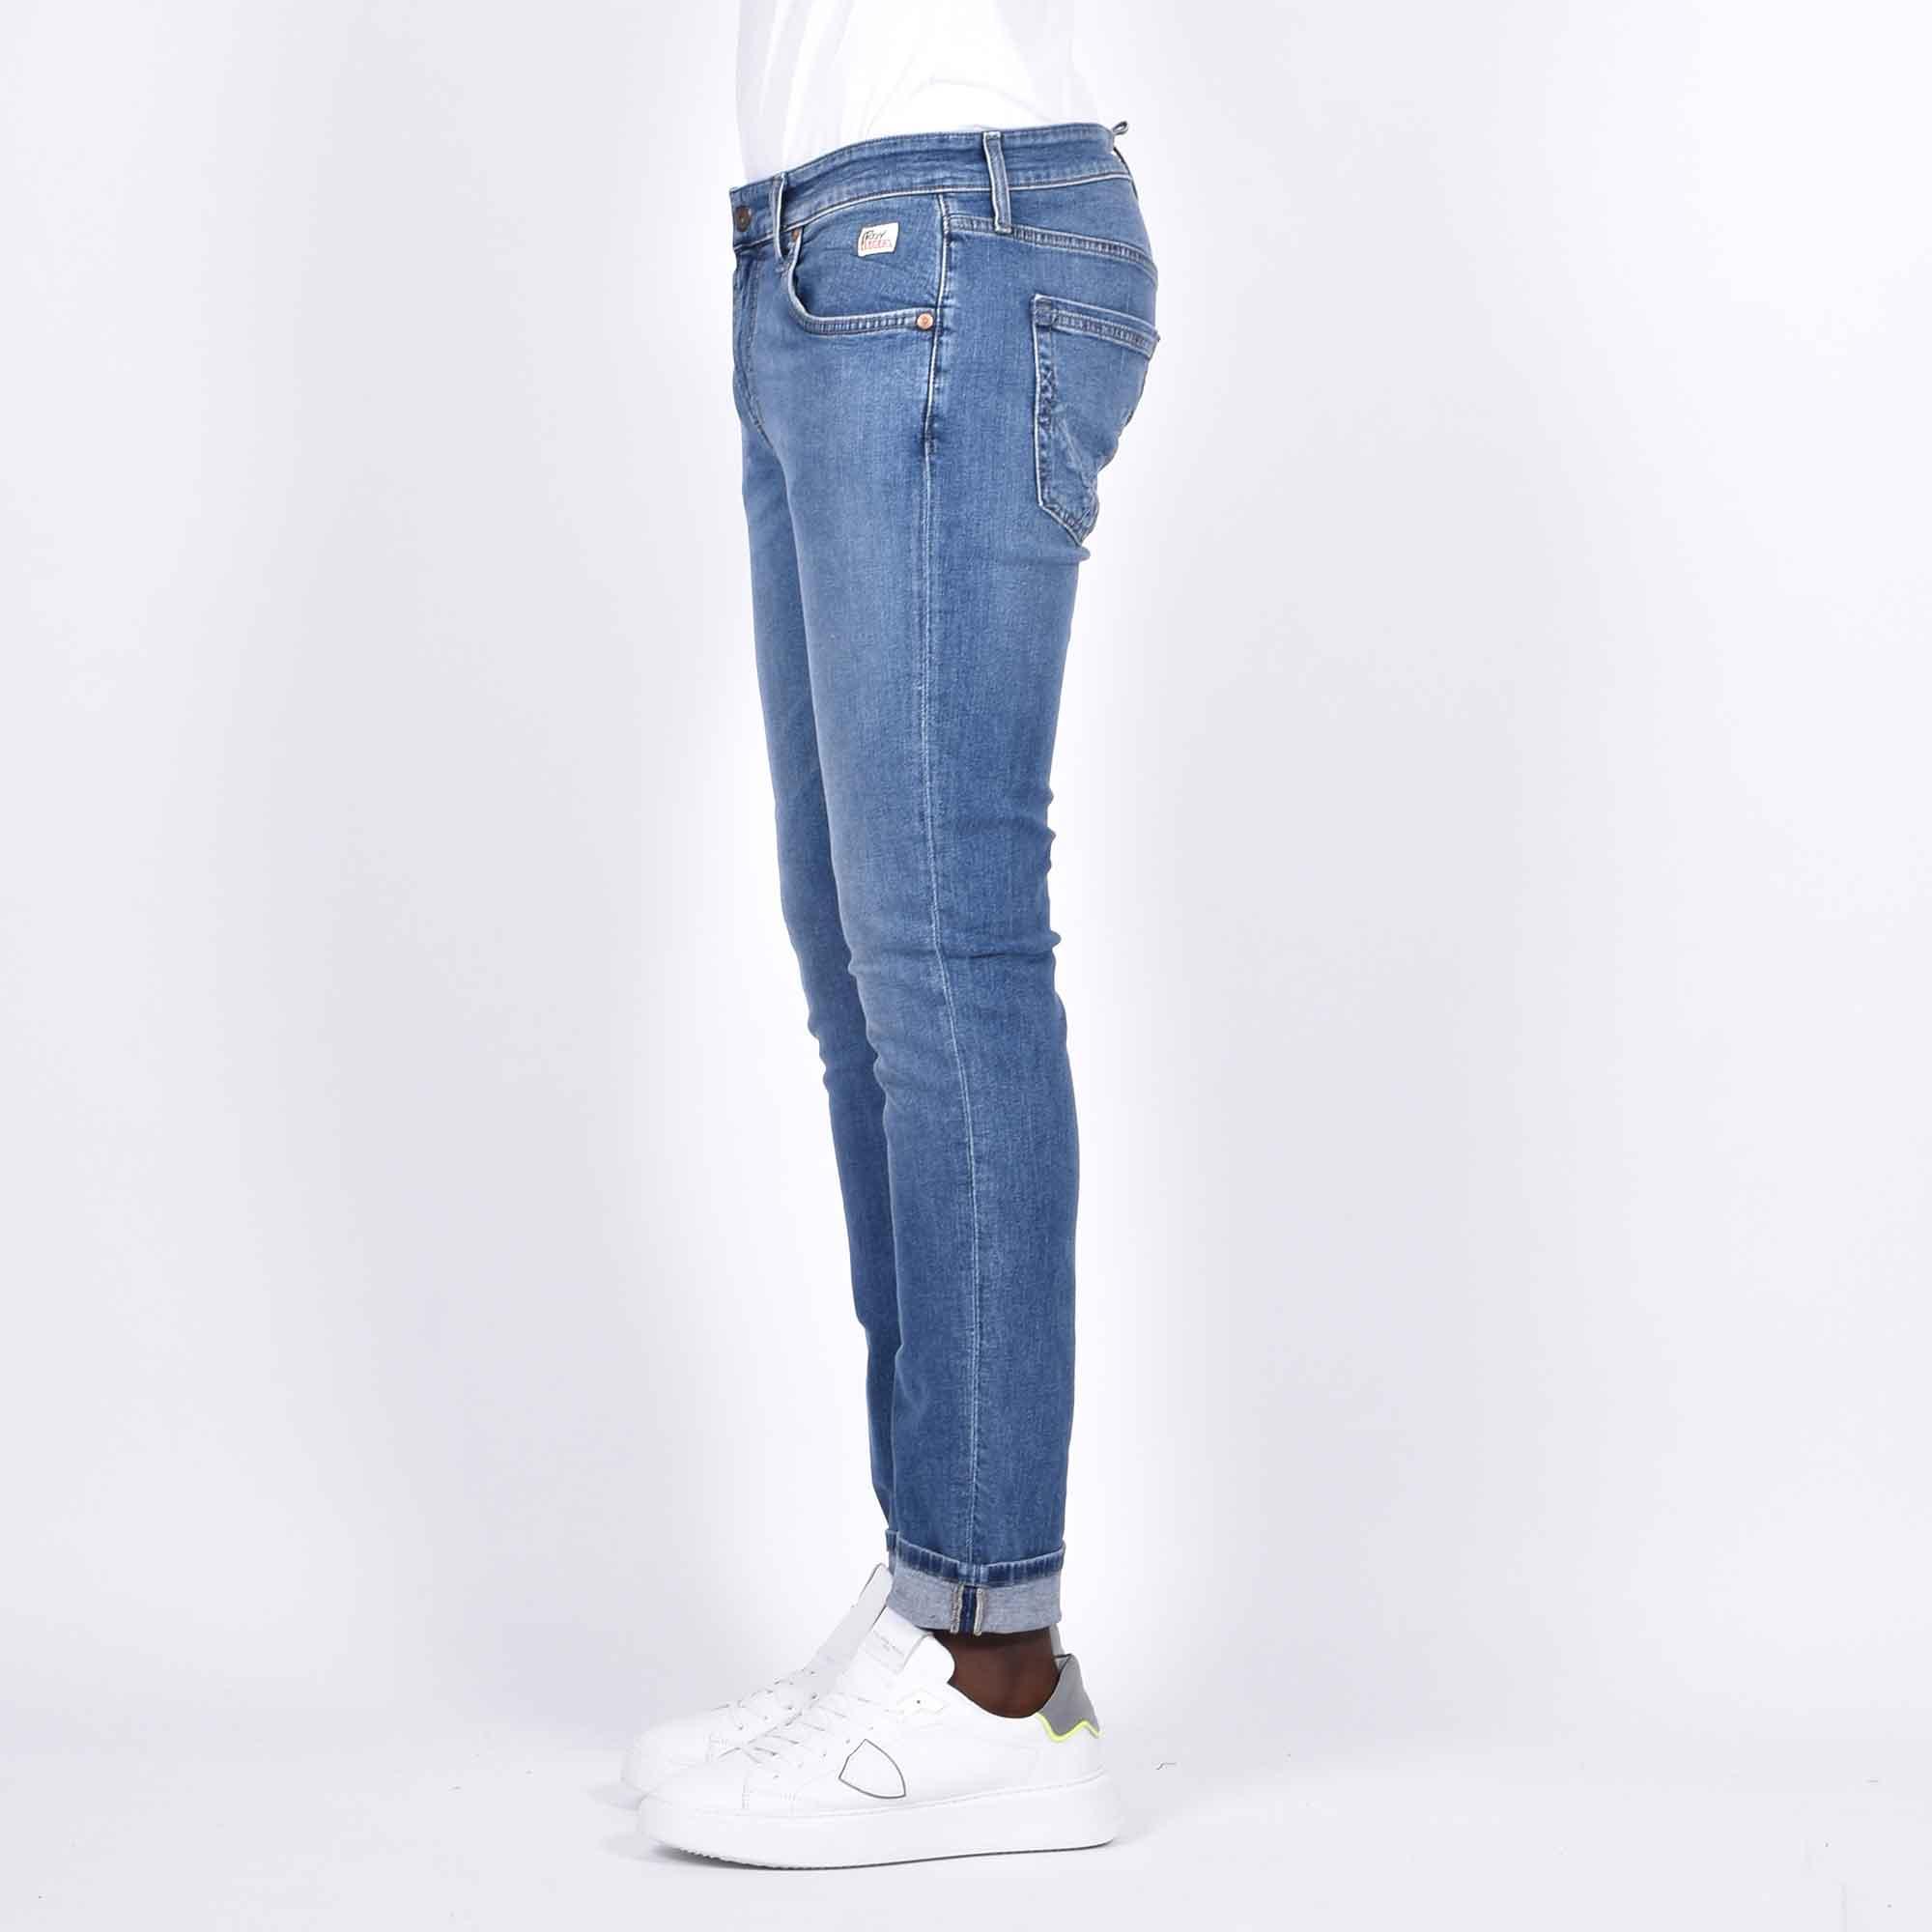 Jeans 317 emmi- Denim chiaro